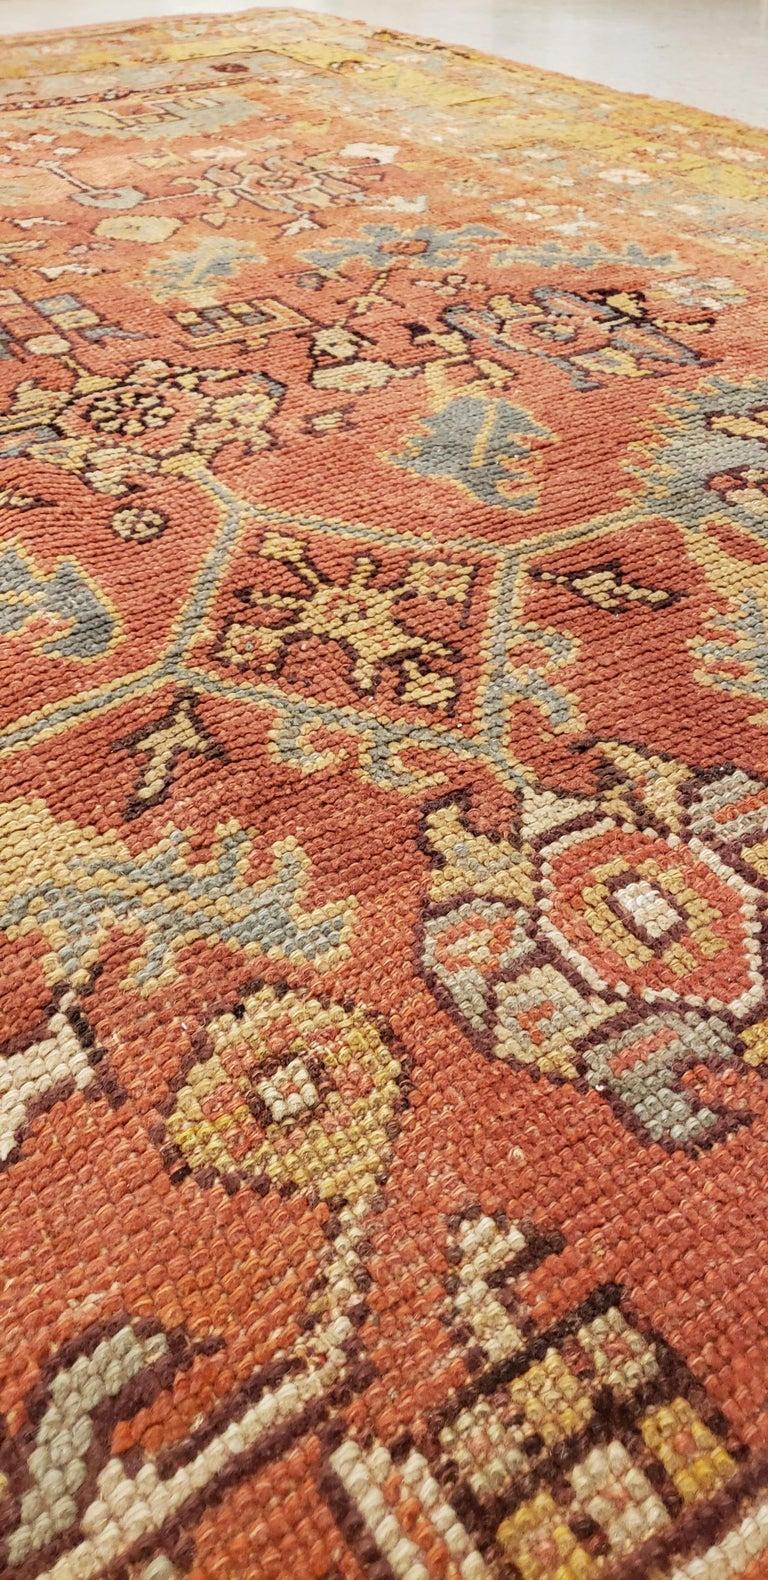 19th Century Oushak Carpet, Oriental Rug, Handmade Rug Saffron, Light Blue and Coral For Sale